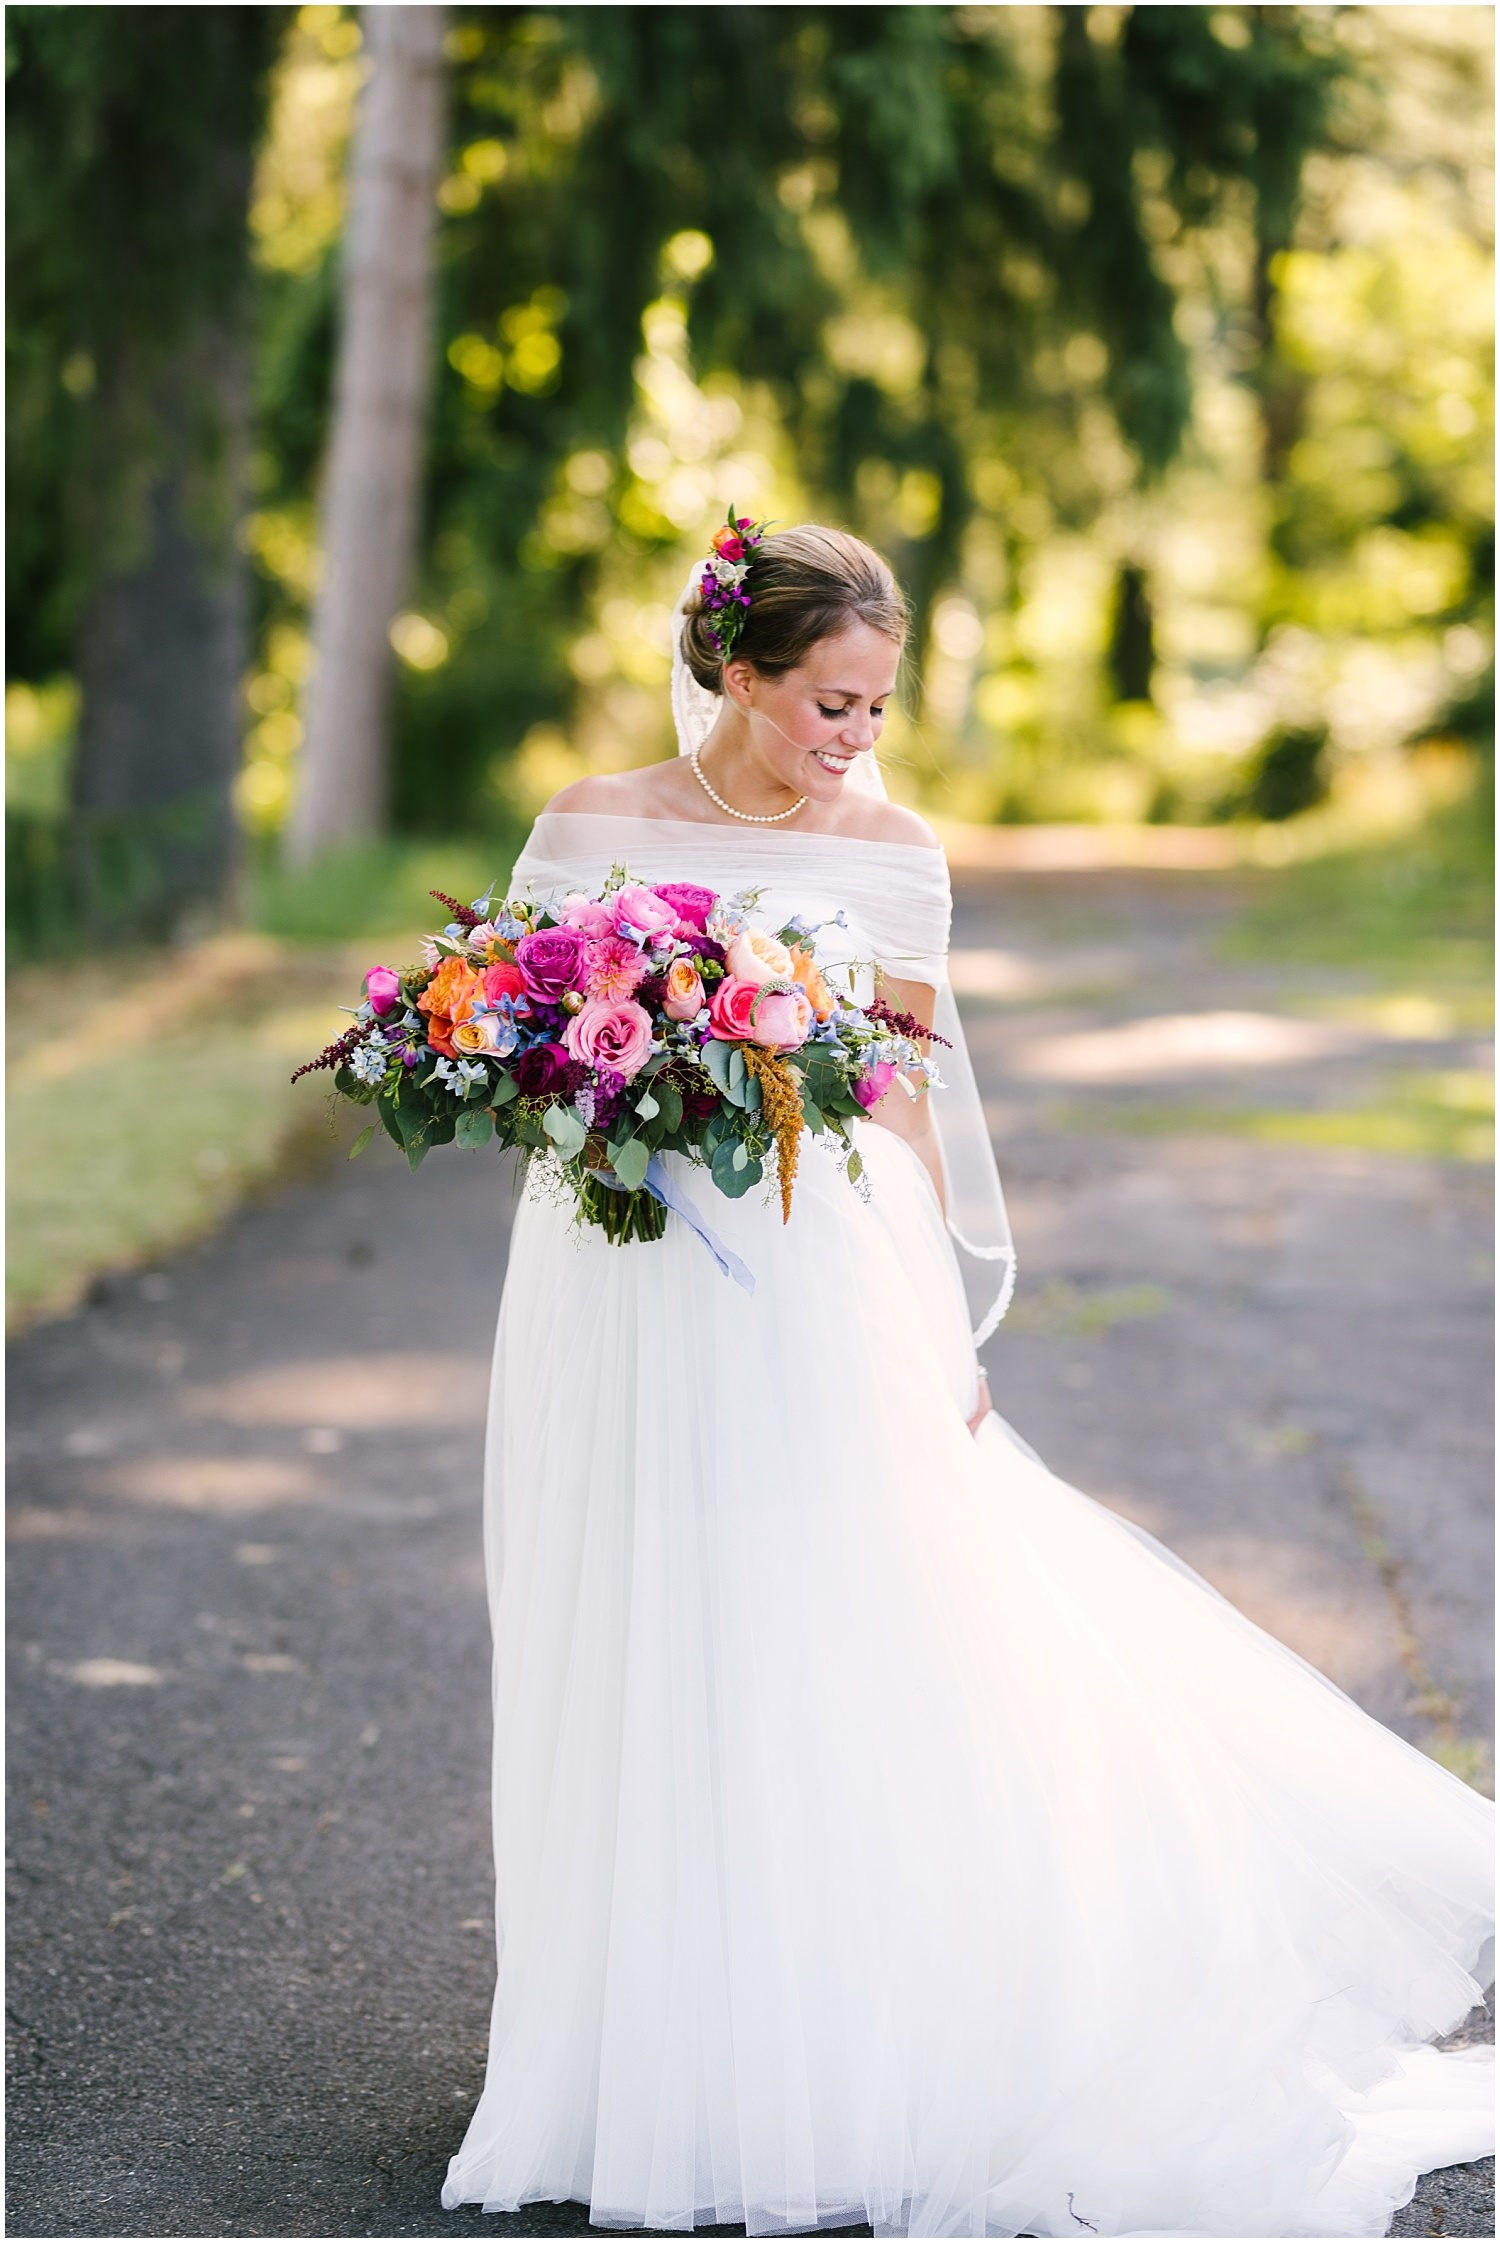 traditions+at+the+glen+wedding+binghamton+wedding (78).jpg